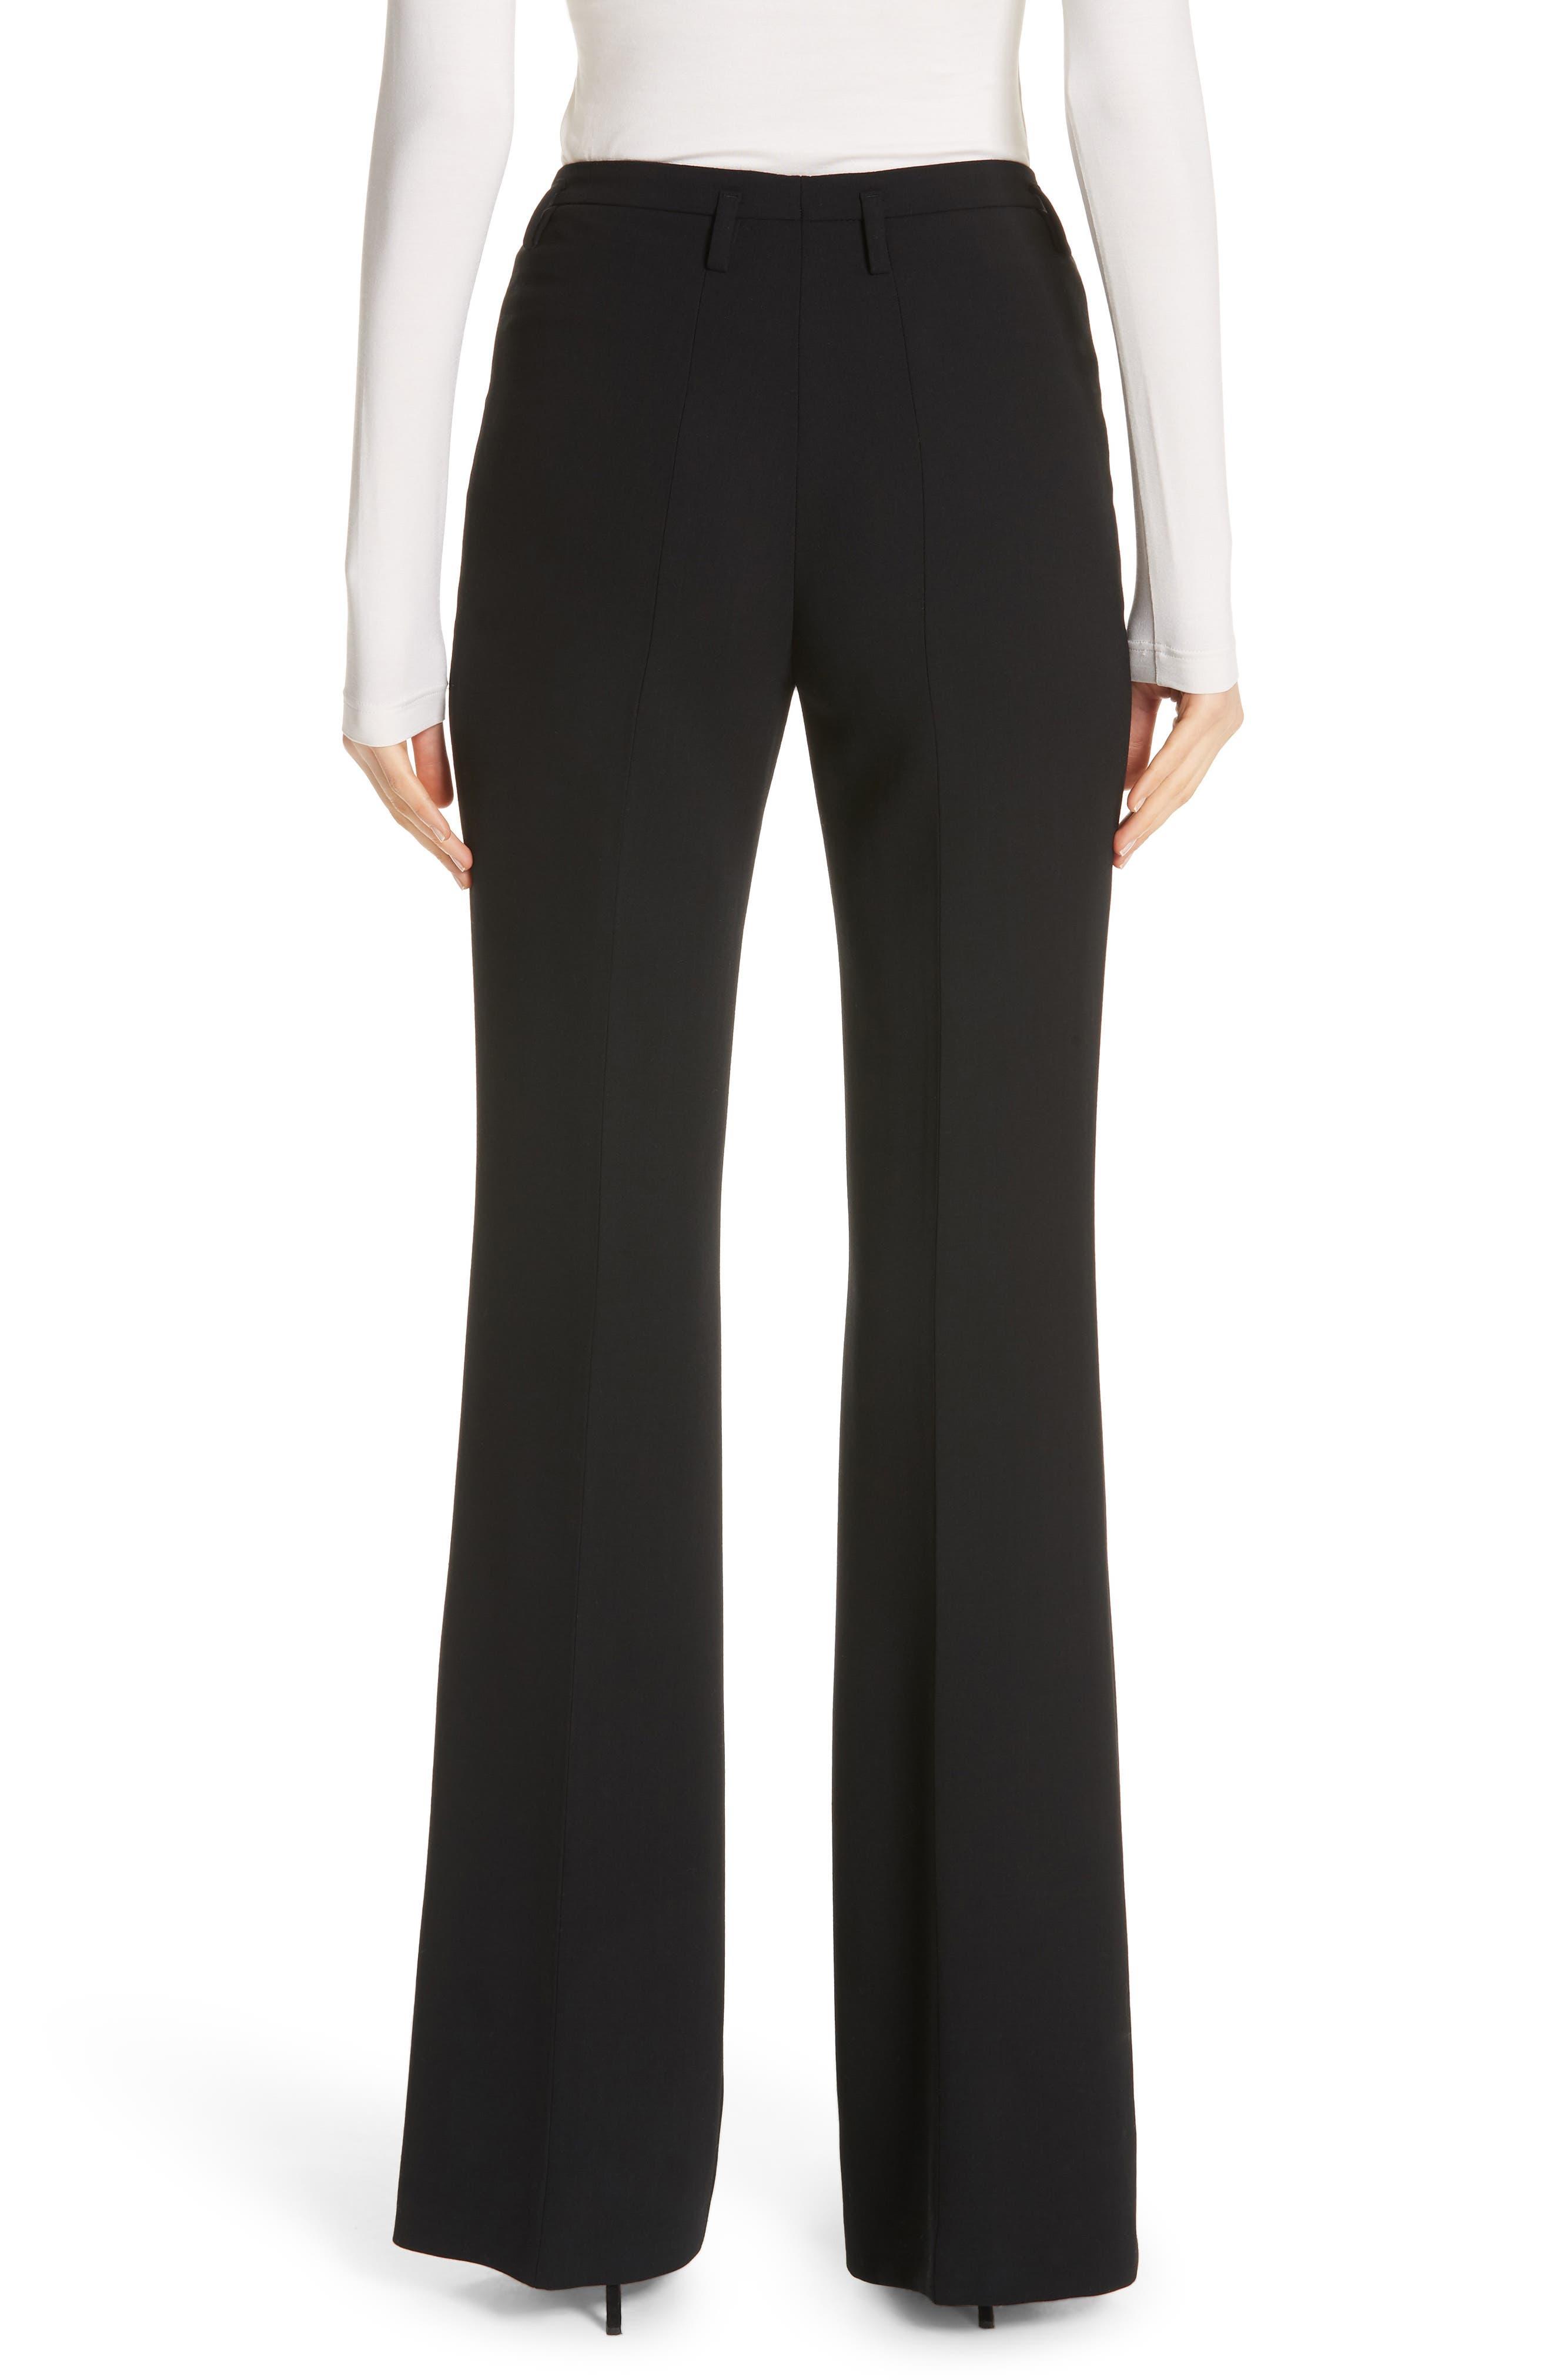 AKRIS, Farrah Stretch Wool Flare Pants, Alternate thumbnail 2, color, BLACK